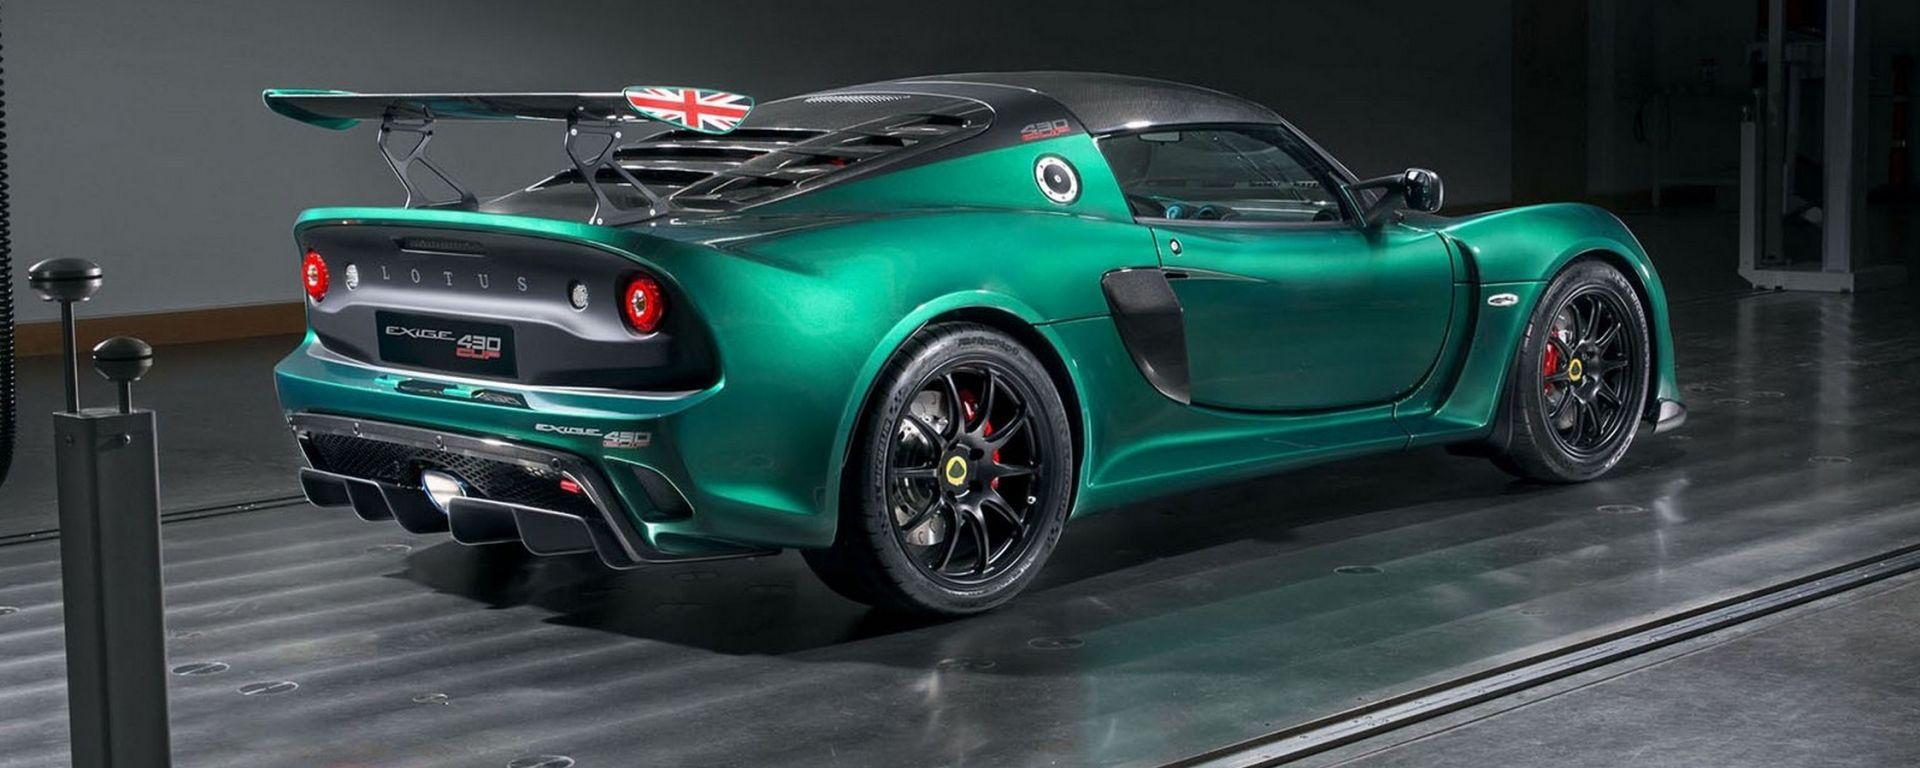 Lotus Exige Cup 430: pensata per la pista, pronta per la strada